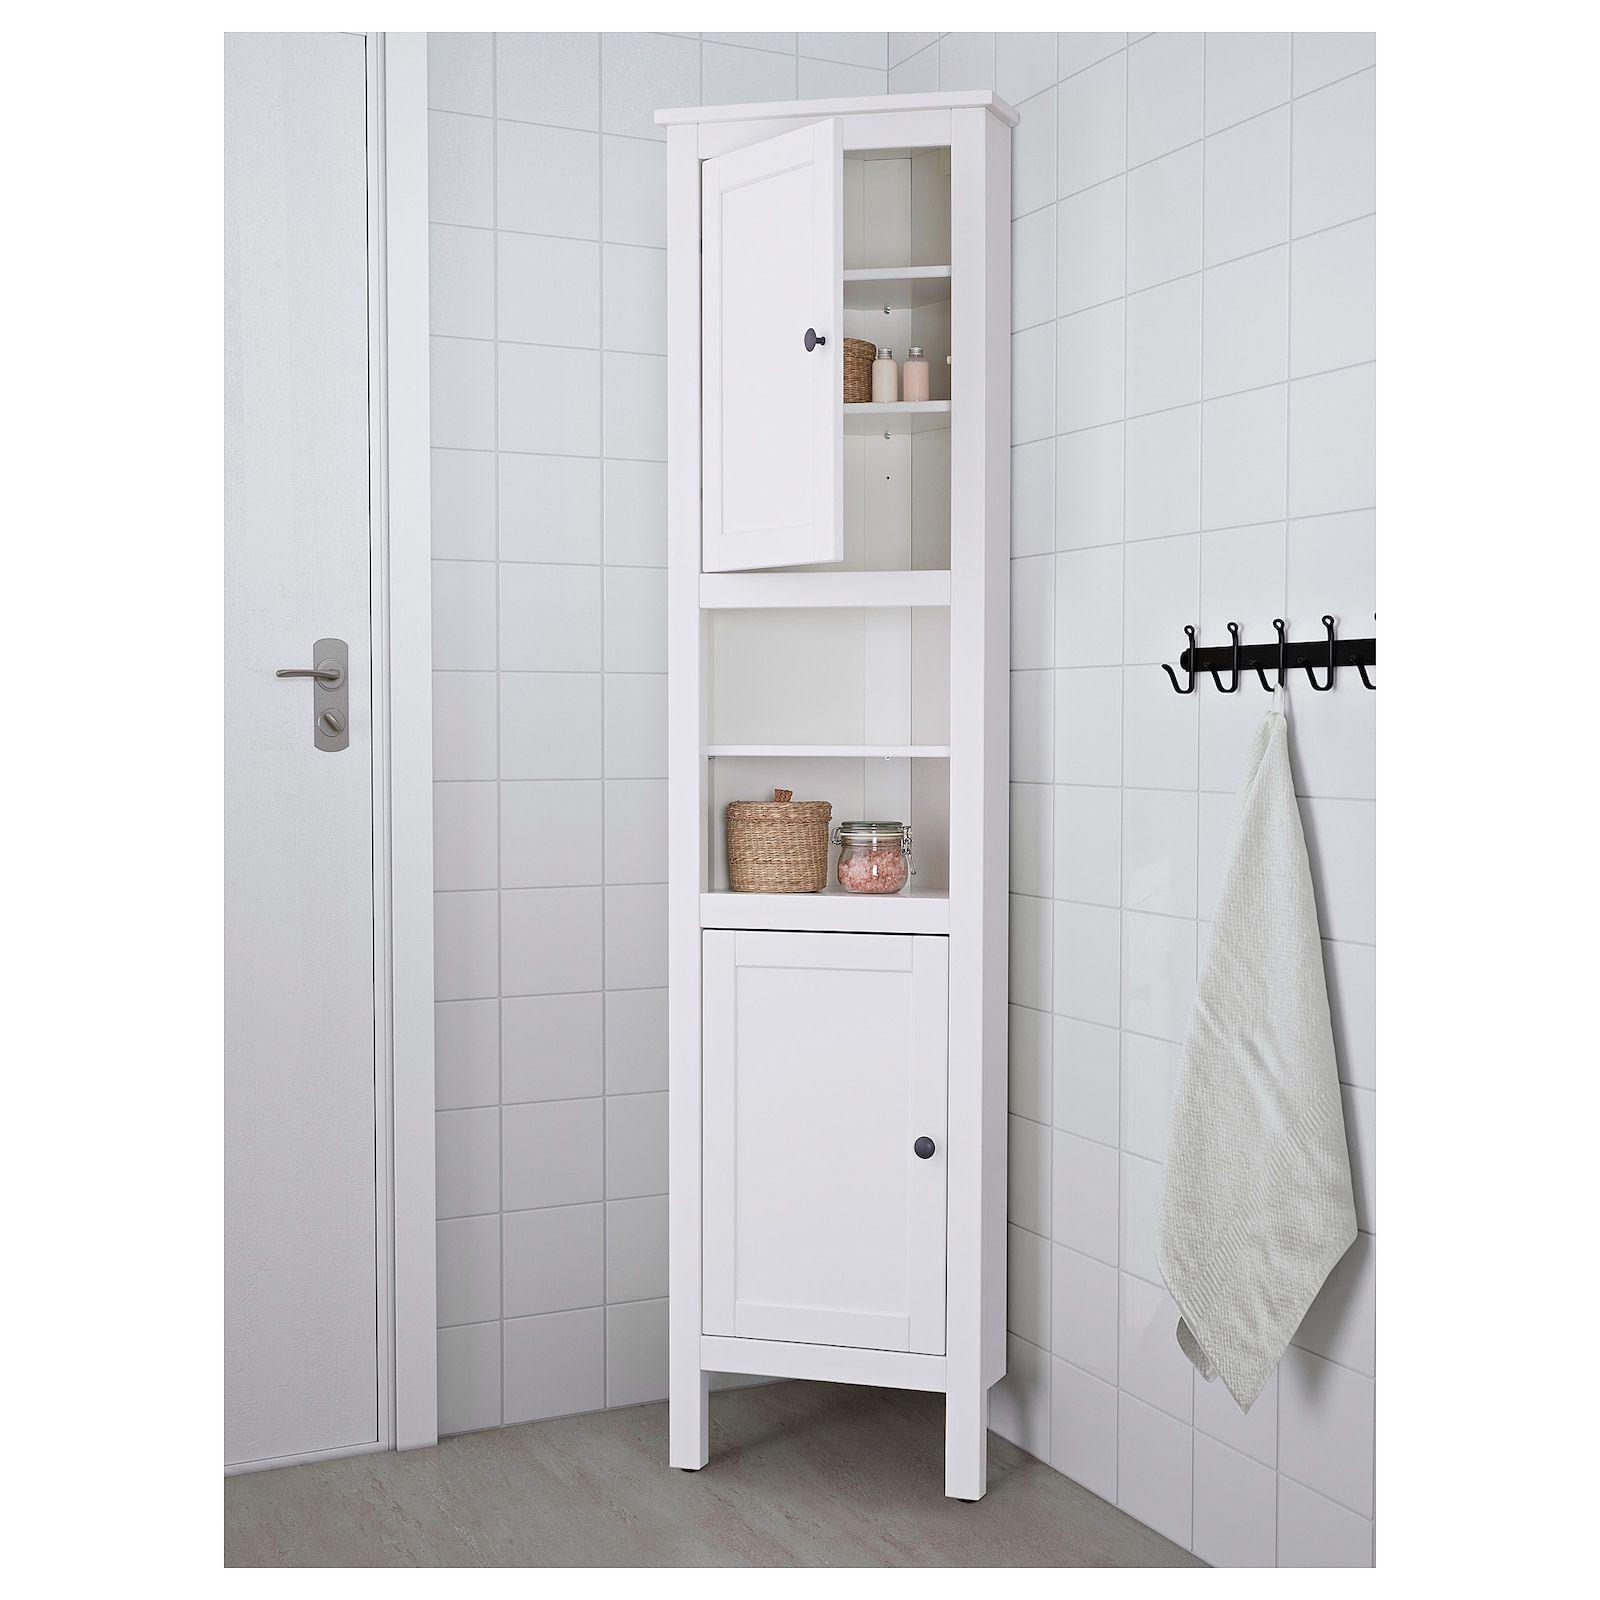 Hemnes Corner Cabinet White 20 1 2x14 5 8x78 3 8 Ikea In 2021 Bathroom Corner Cabinet Bathroom Tall Cabinet Small Bathroom Cabinets